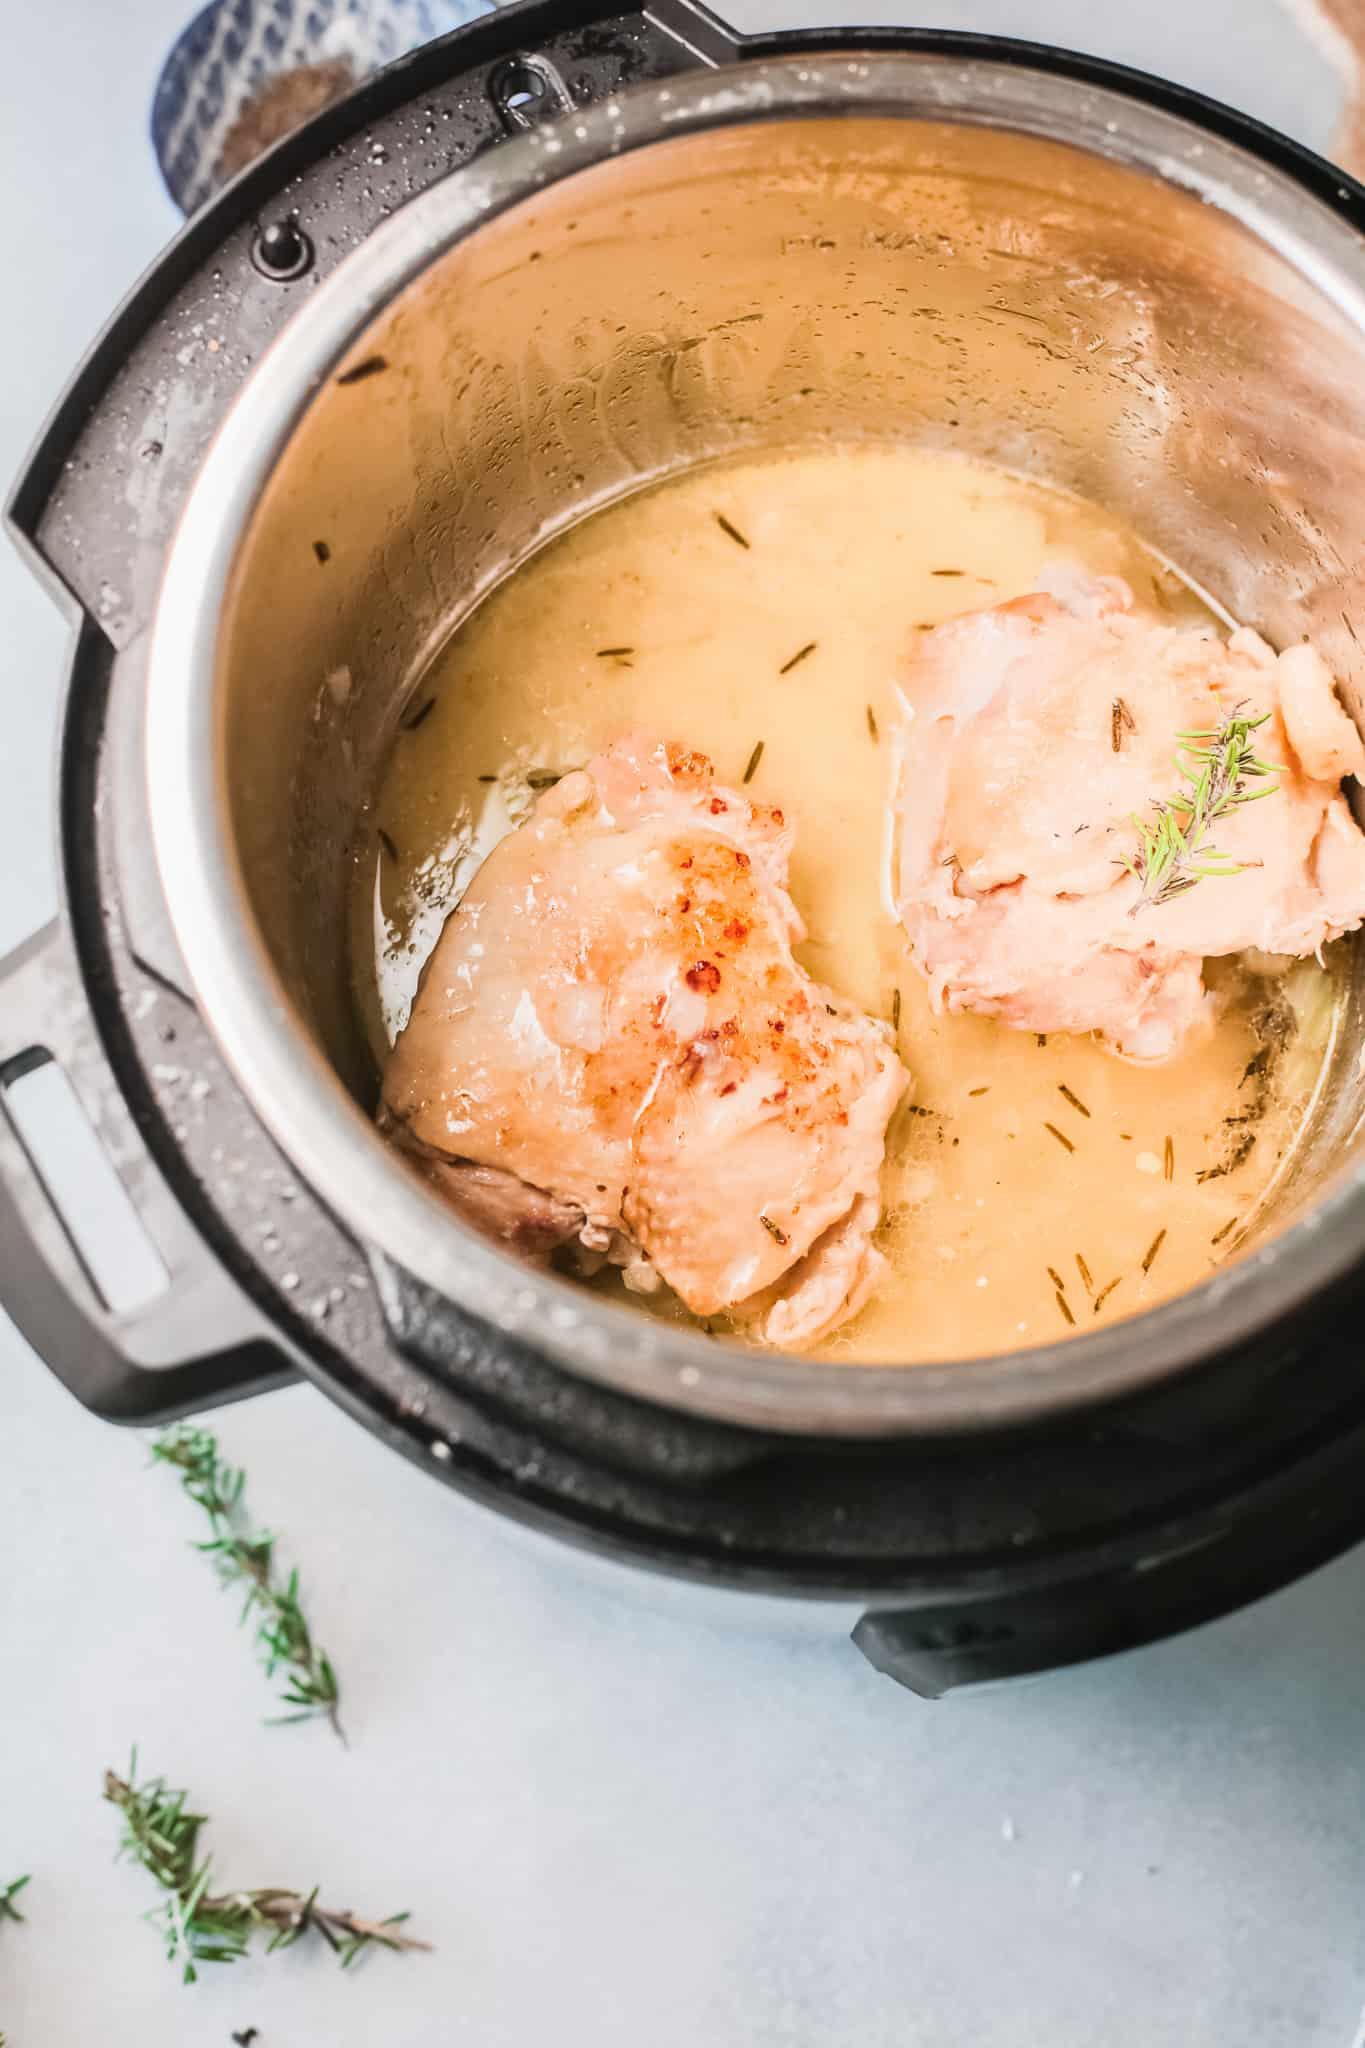 chicken thighs inside the instant pot insert